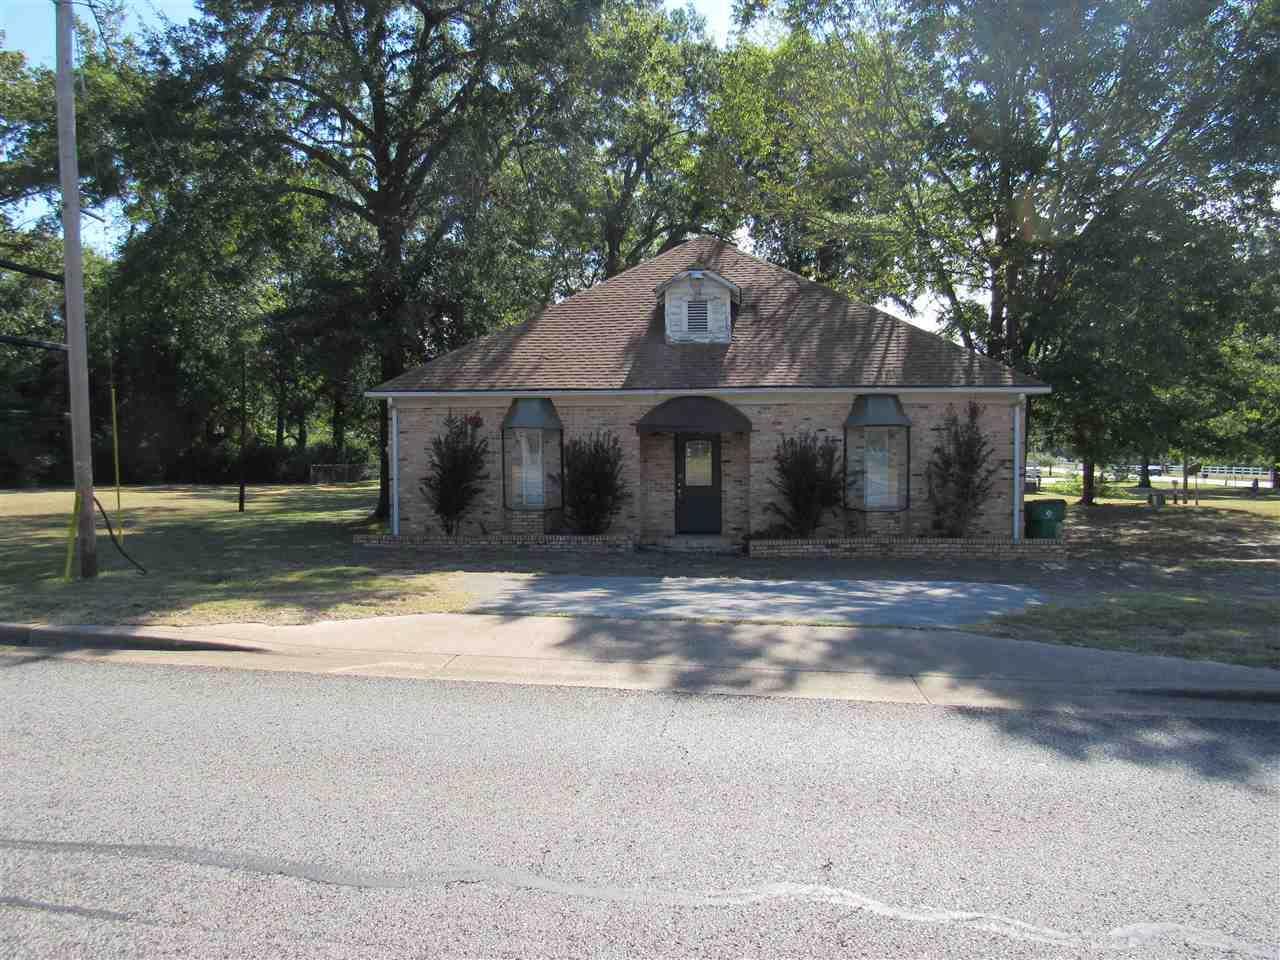 5576 Judson Rd. - Photo 1